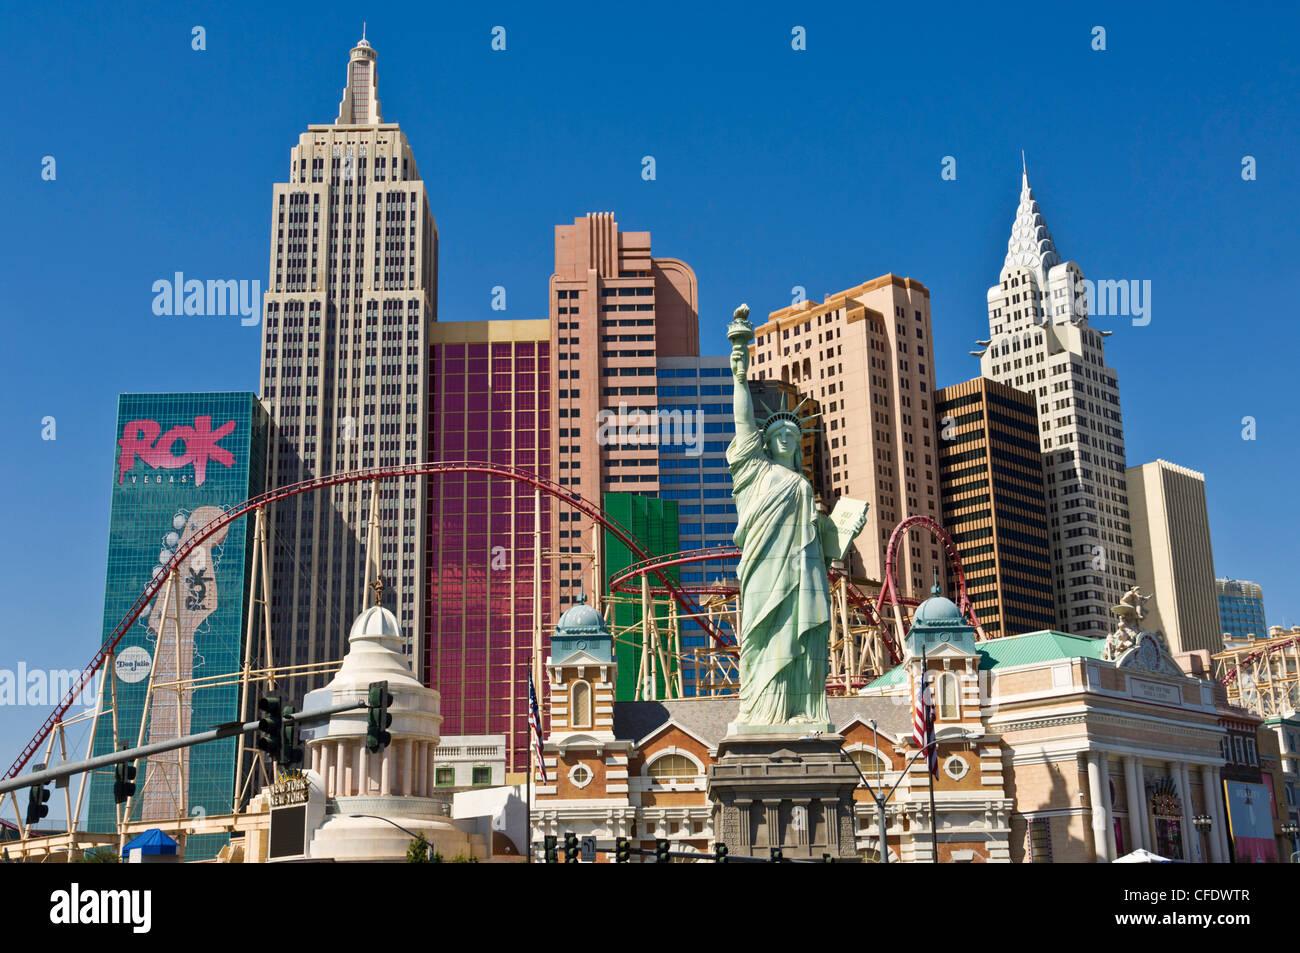 New York Hotel Roller Coaster